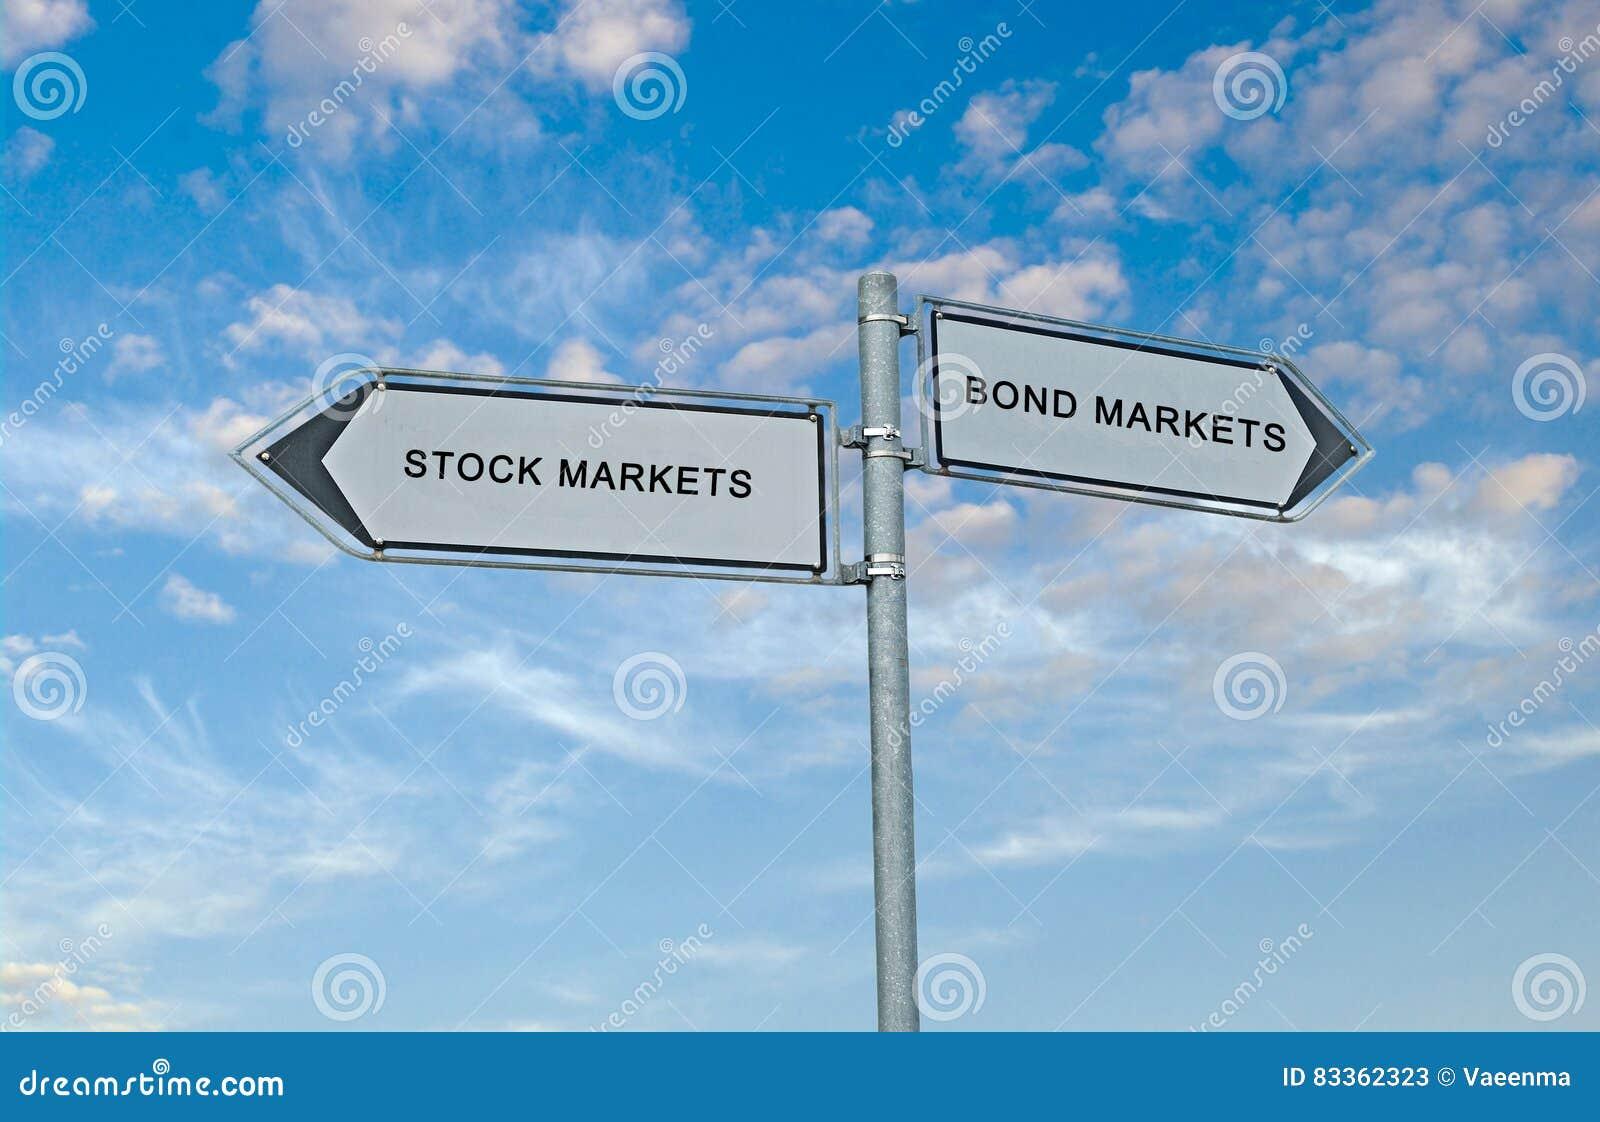 Bond market and stock market